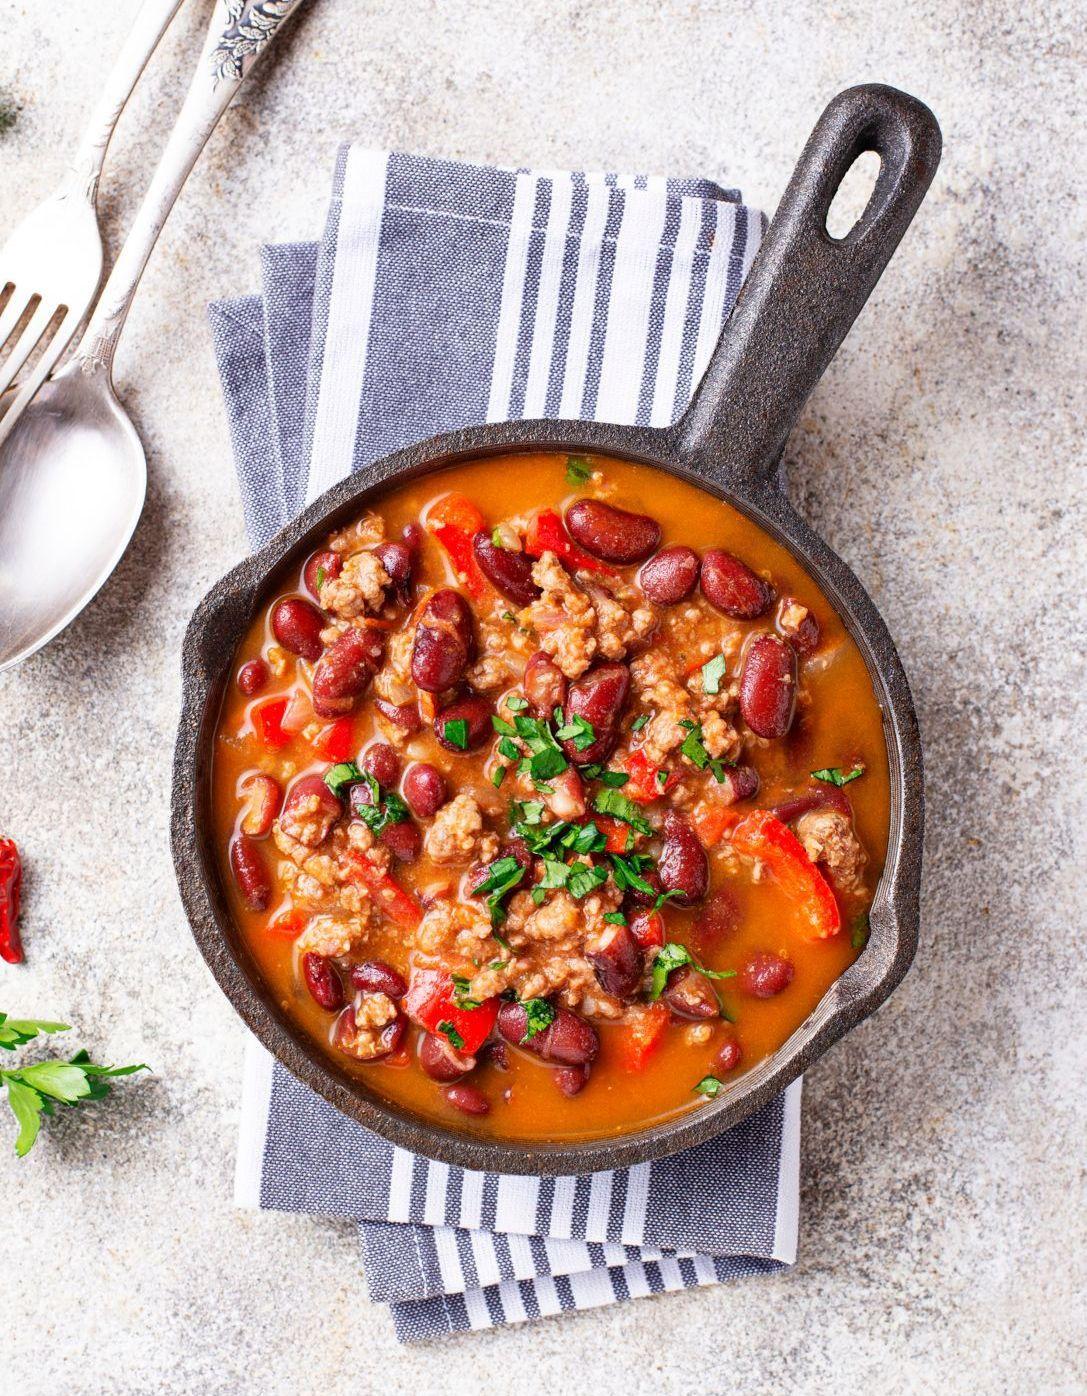 Le chili con carne maison, la recette qui met toute la famille d'accord